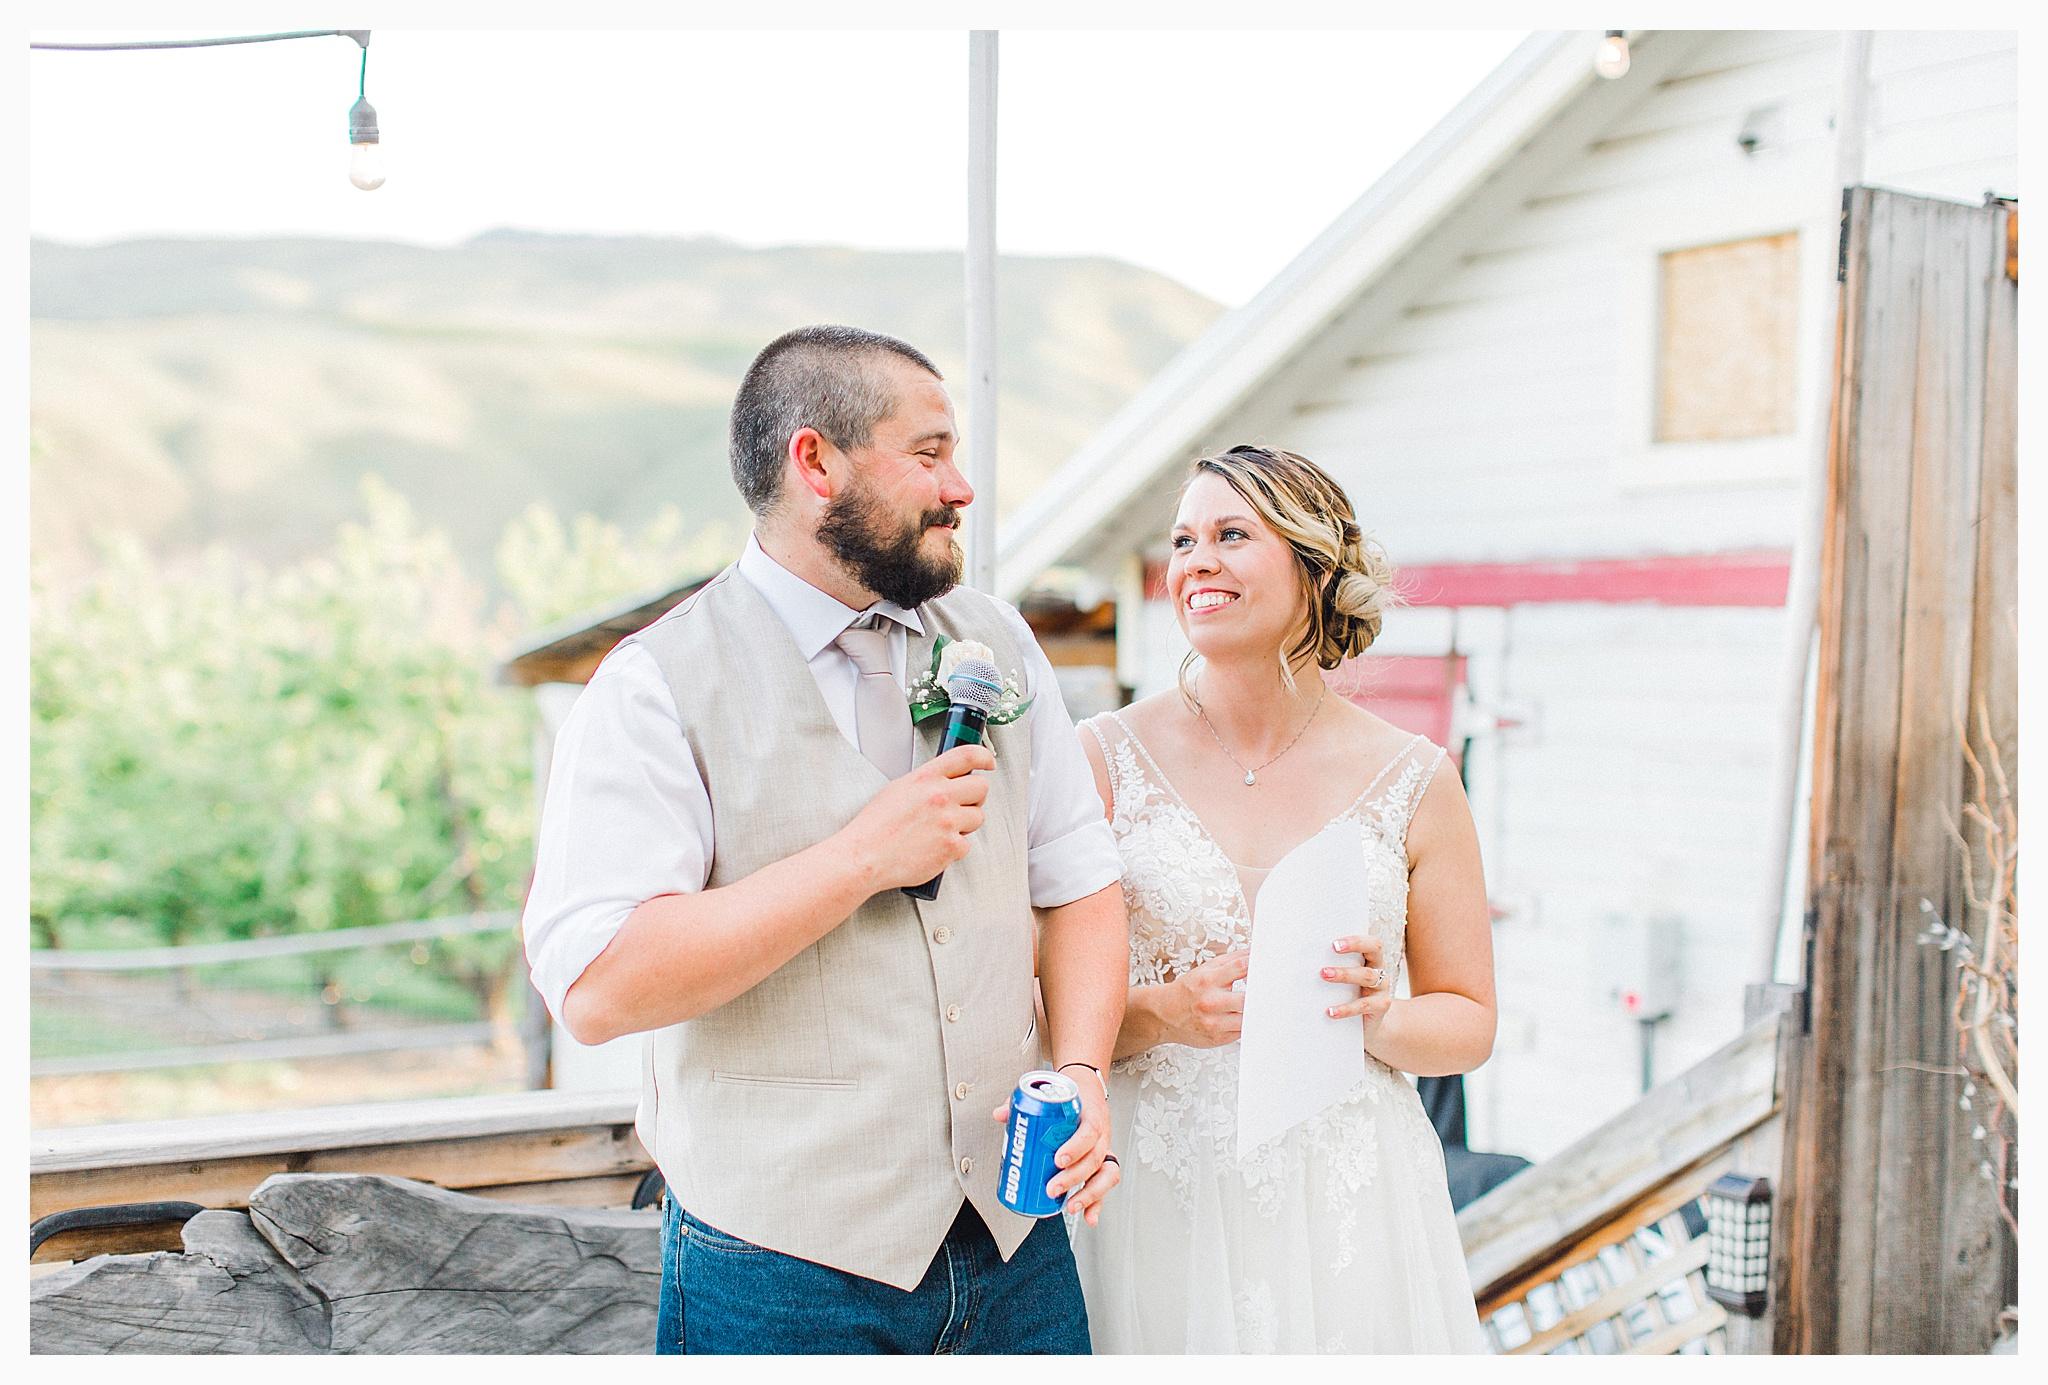 Rustic barn wedding in Wenatchee Washington at Sunshine Ranch on Easy Street, Emma Rose Company Seattle PNW Light and Airy Wedding Photographer_0108.jpg